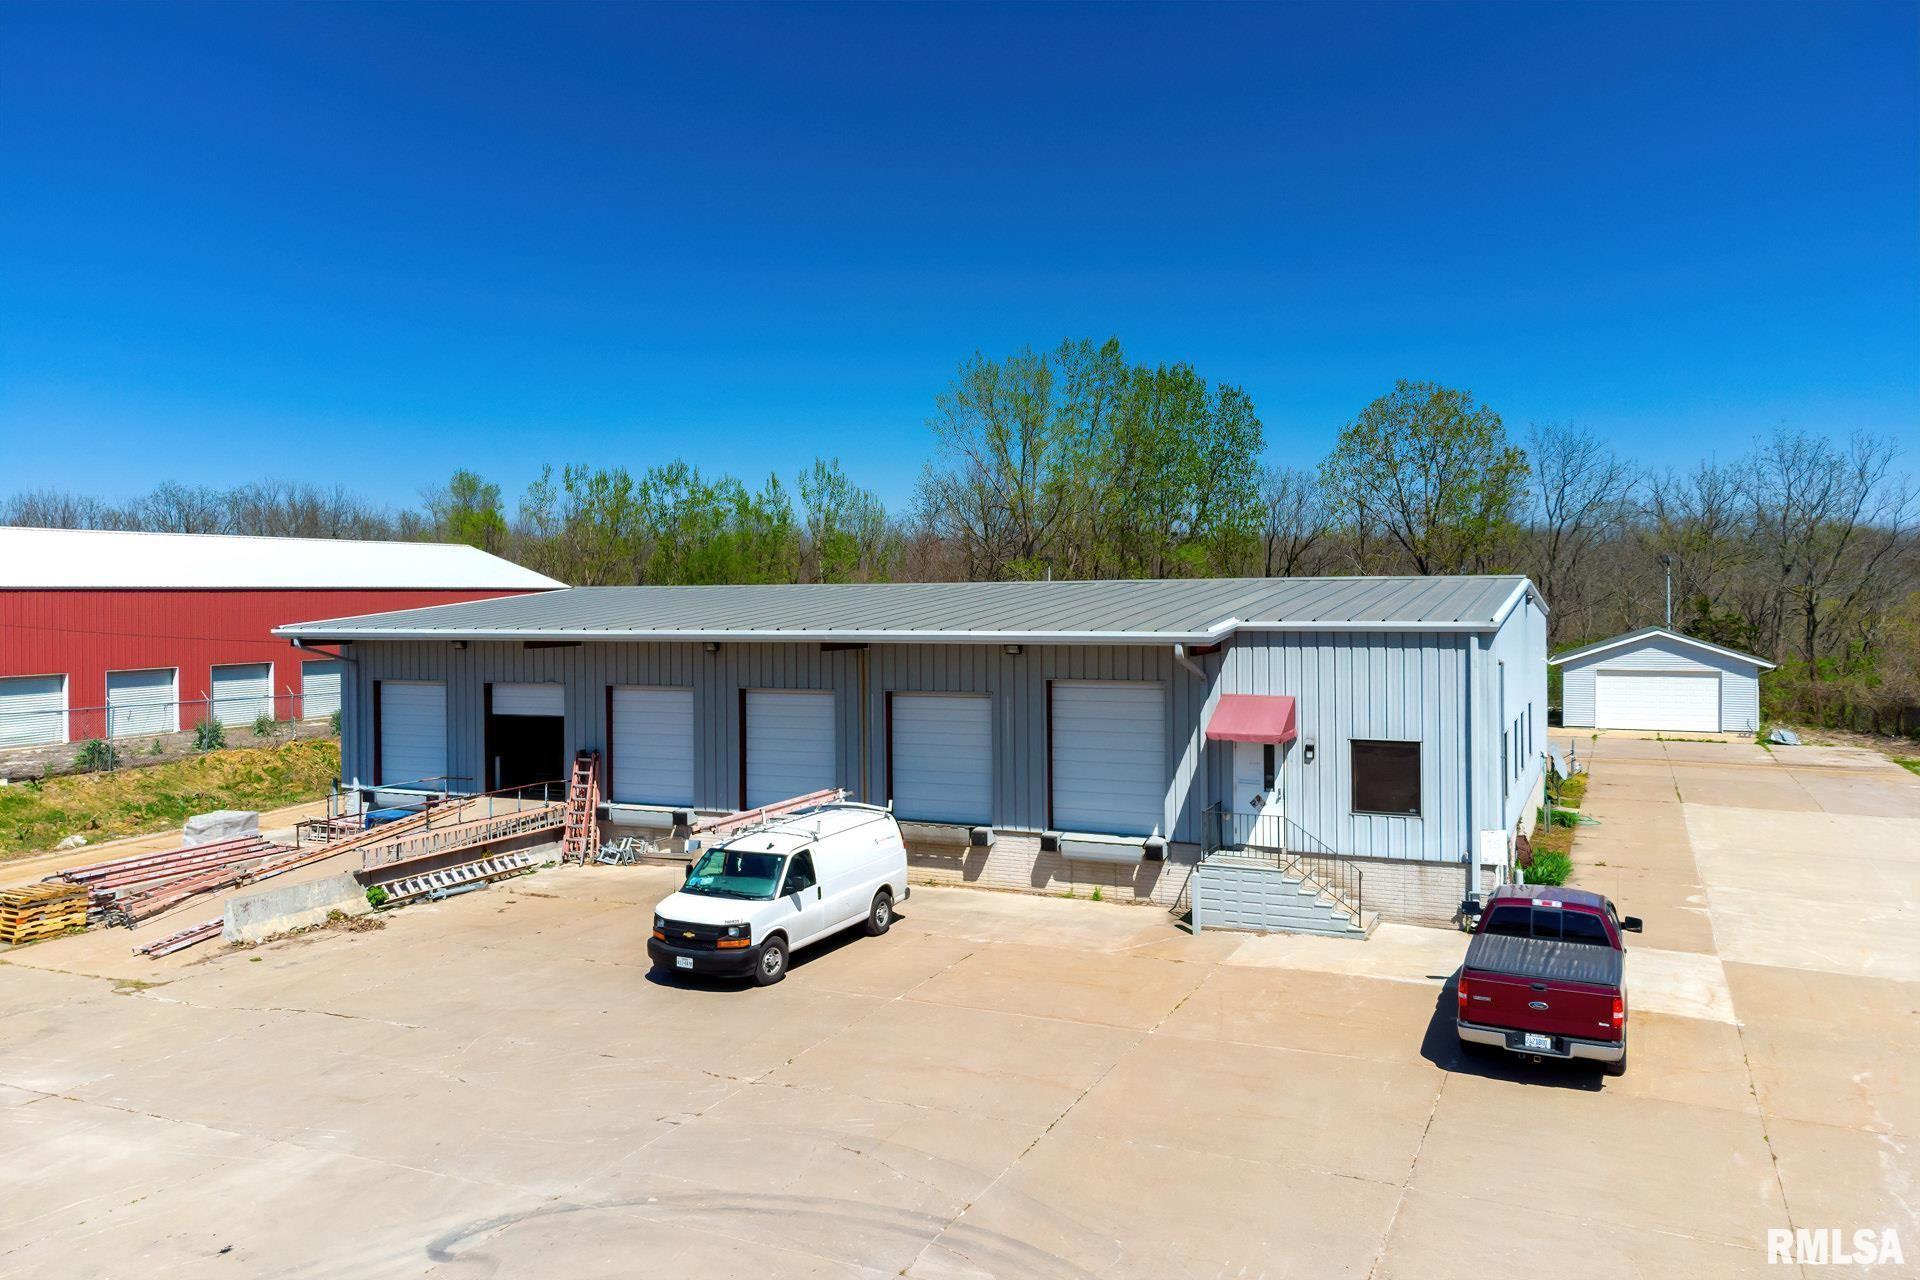 13759 110TH Property Photo - Davenport, IA real estate listing